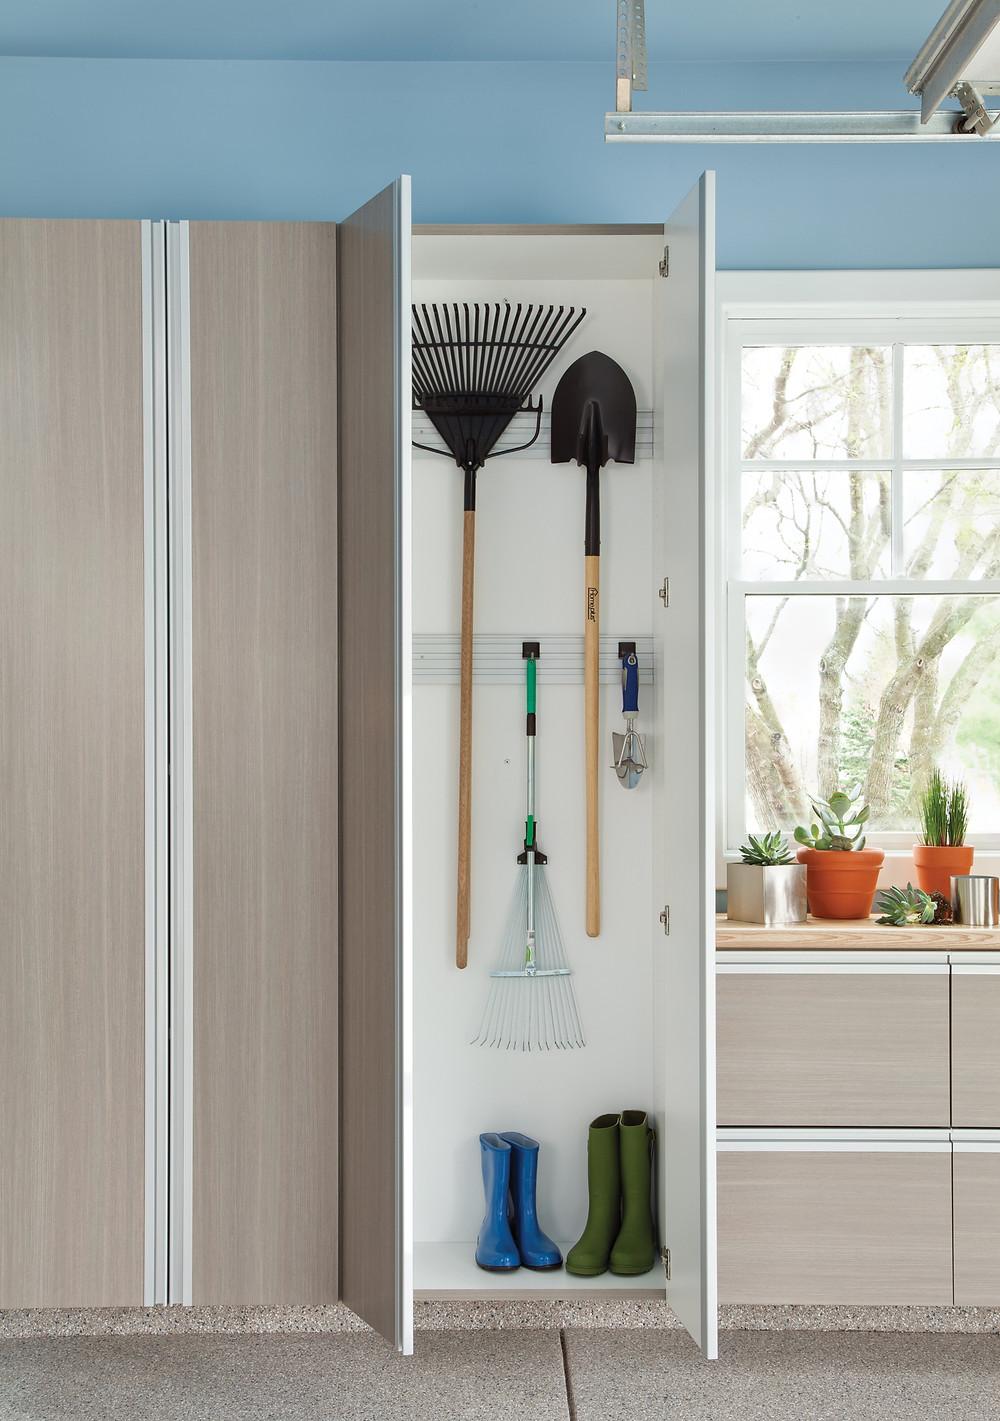 Long, Tall Thin Zone - Garage Storage Cabinets